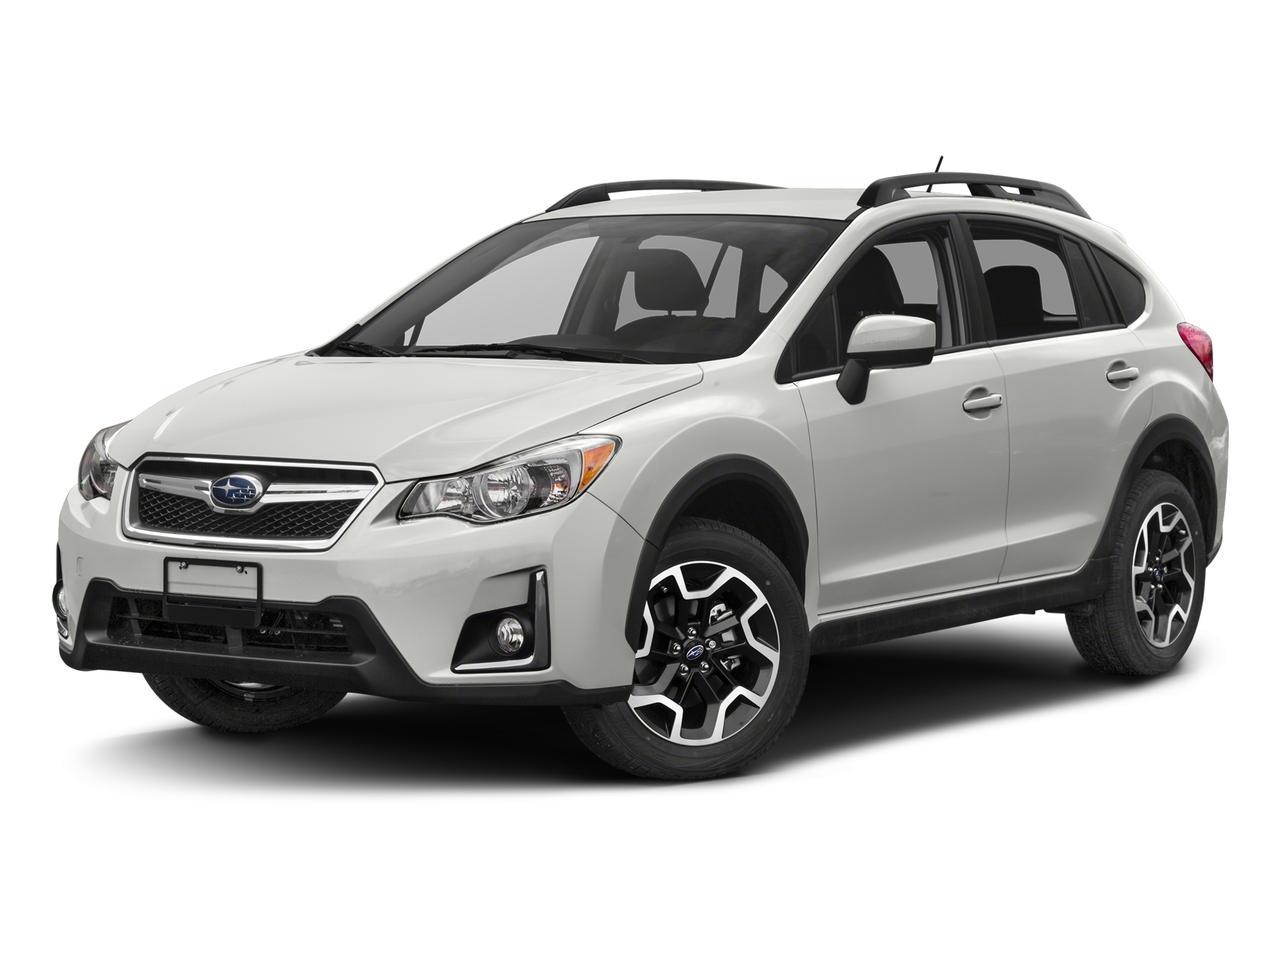 2016 Subaru Crosstrek Vehicle Photo in Allentown, PA 18103